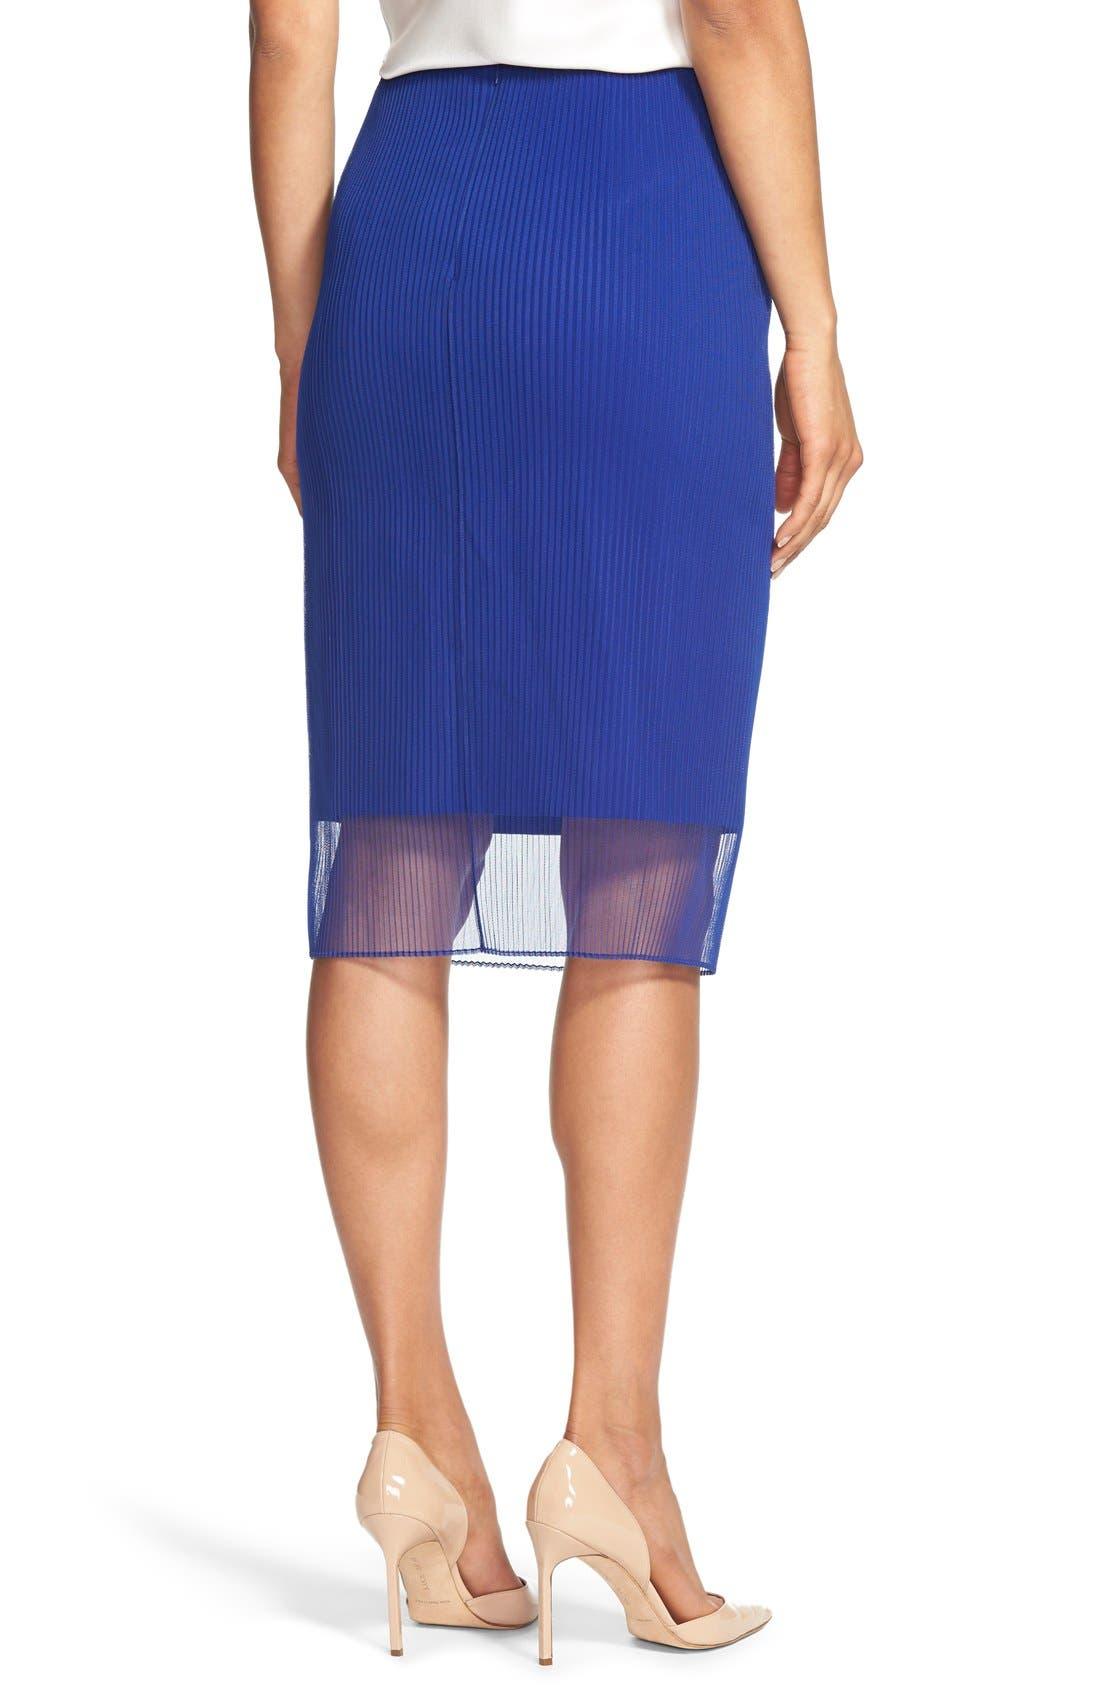 Alternate Image 2  - BOSS 'Veplyti' Plissé Overlay Pencil Skirt